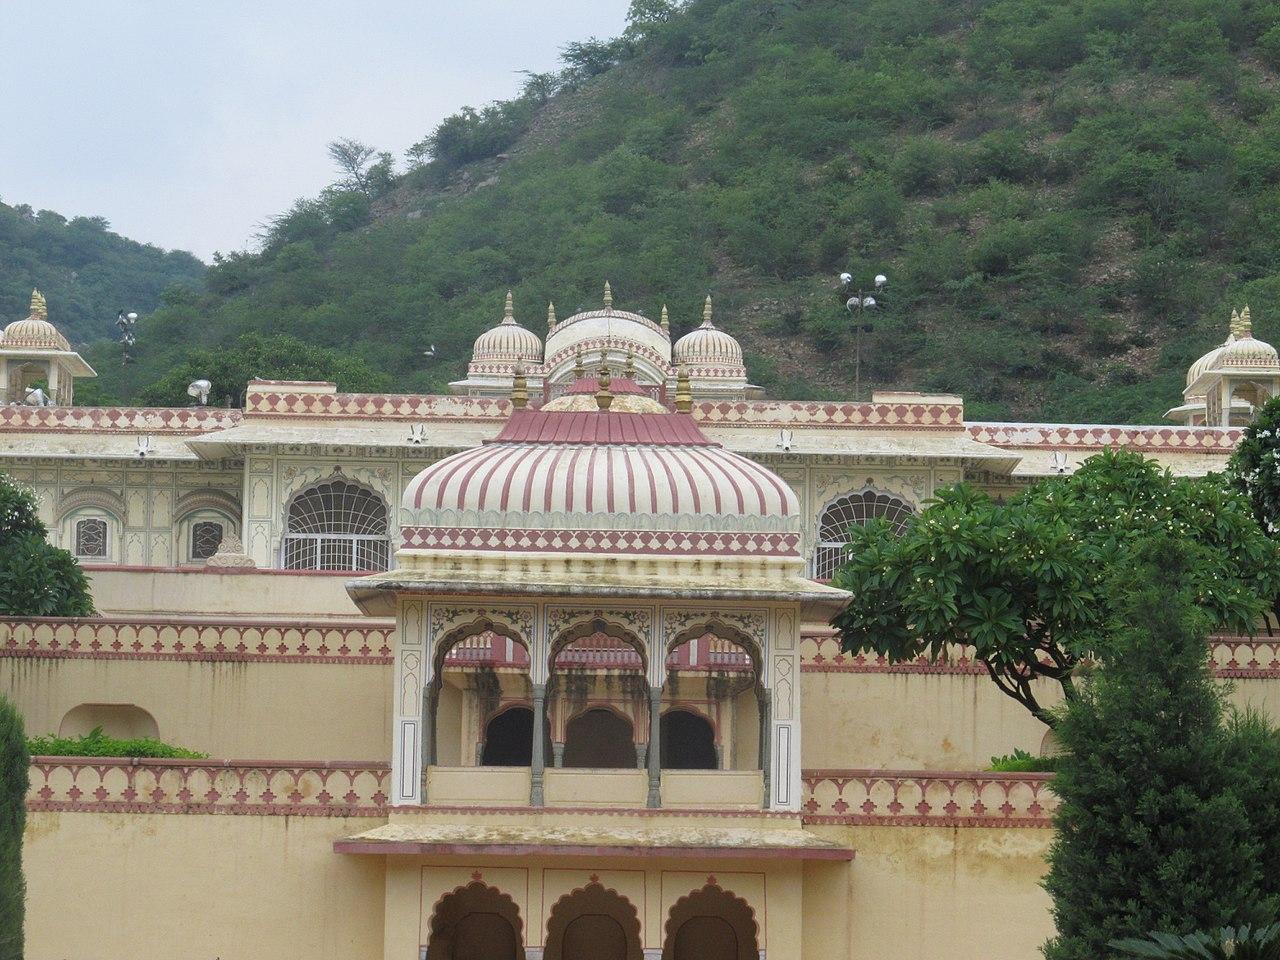 Popular Destination to Visit in Jaipur-Sisodia Rani Garden